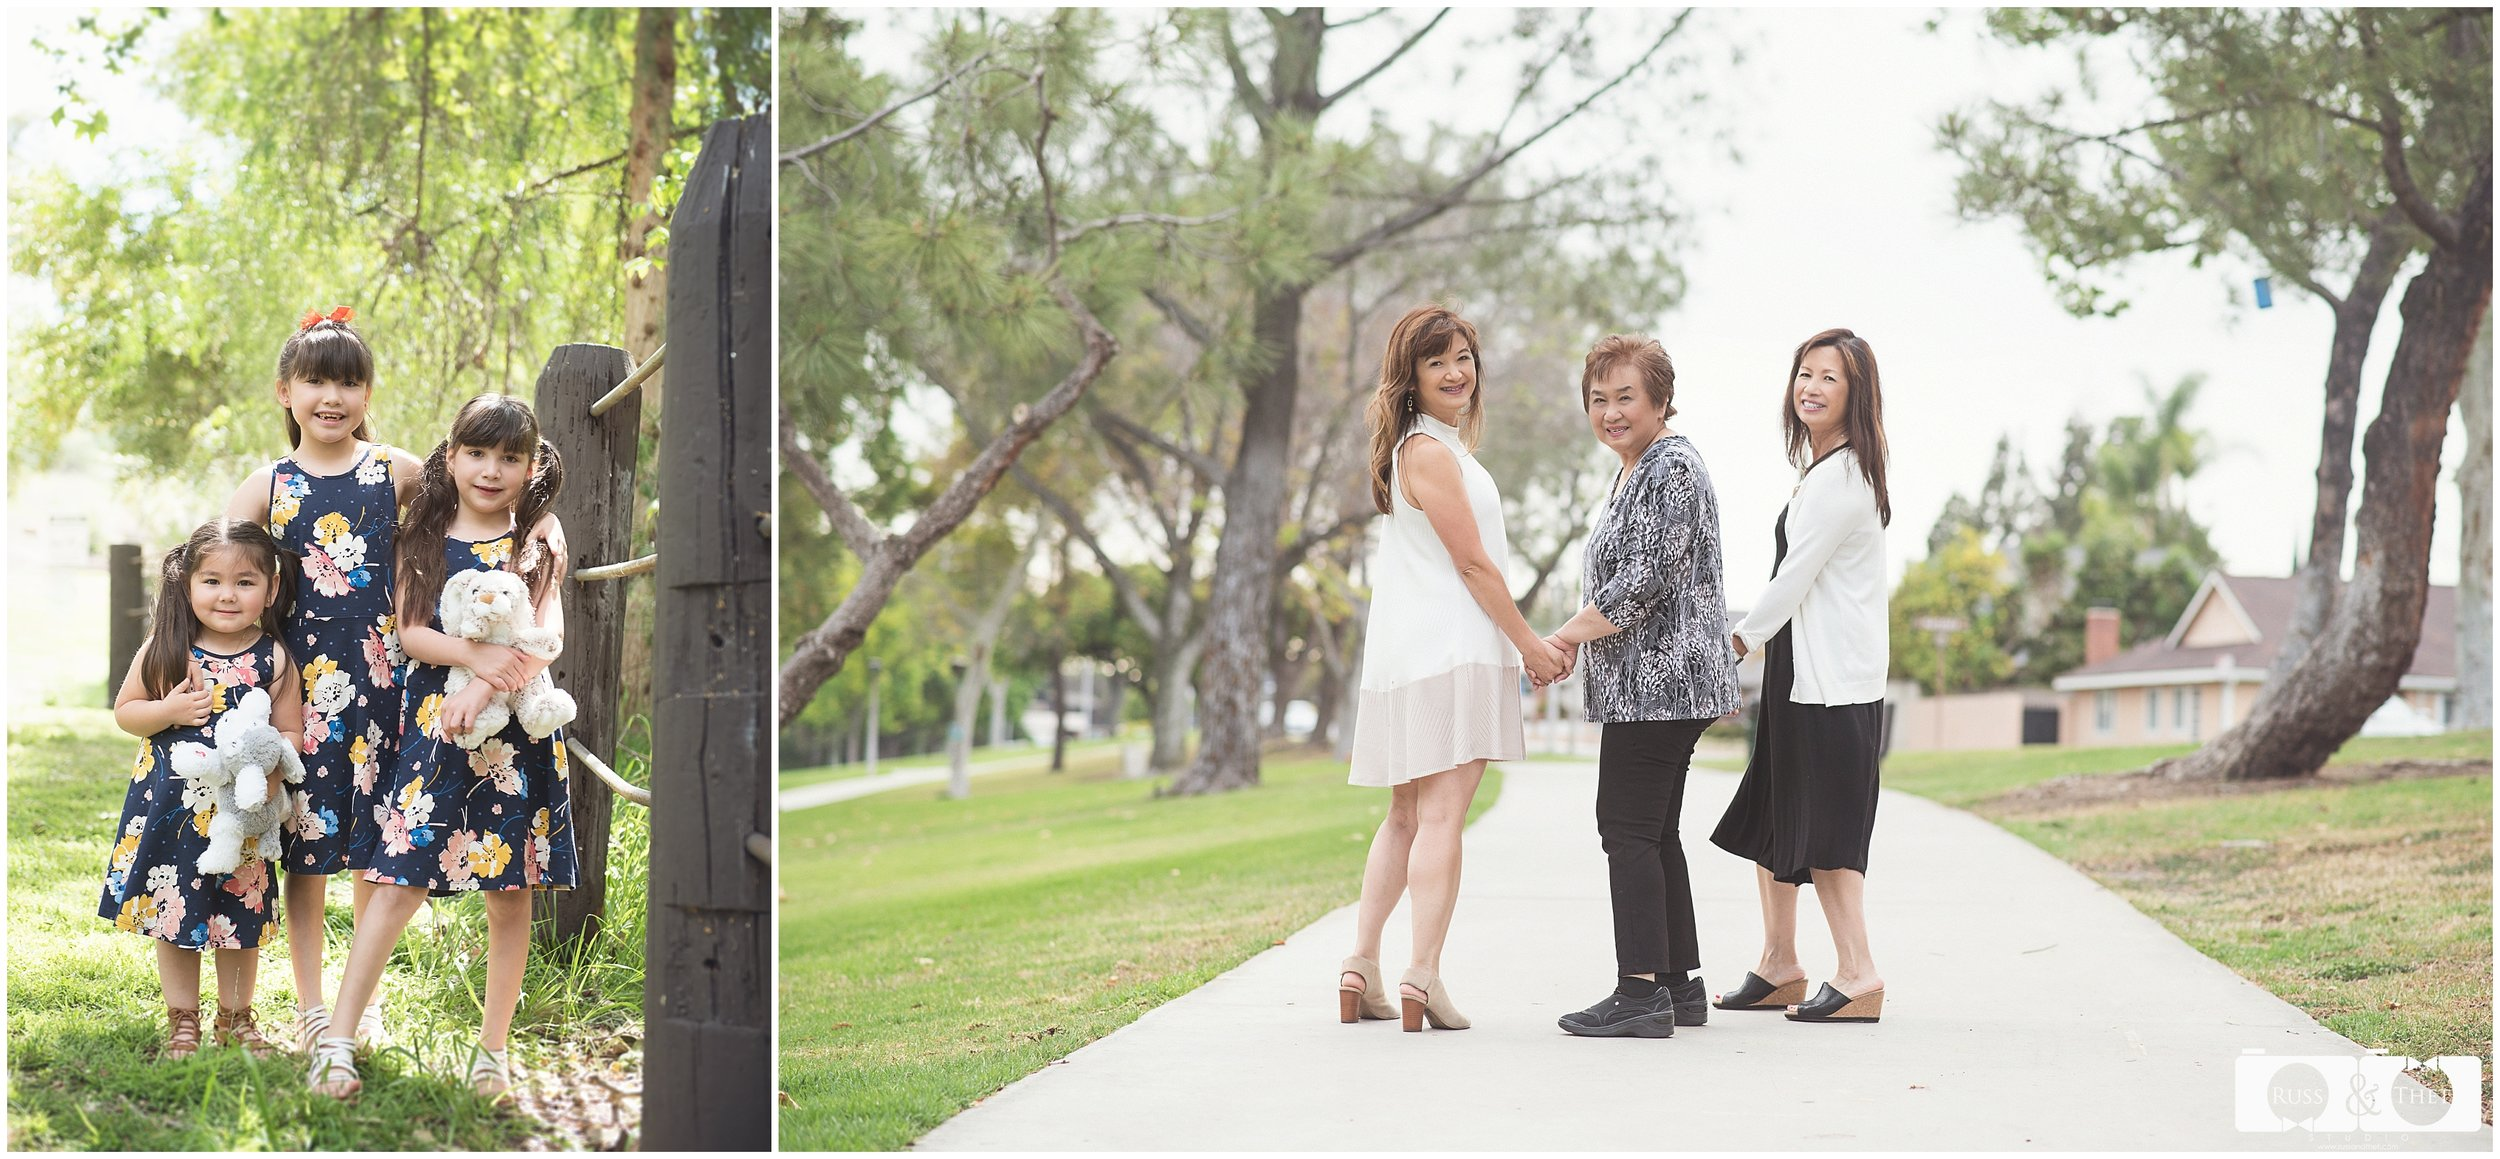 La-Mirada-Creek-Park-Family-Maternity-Kids-Portraits (9).jpg